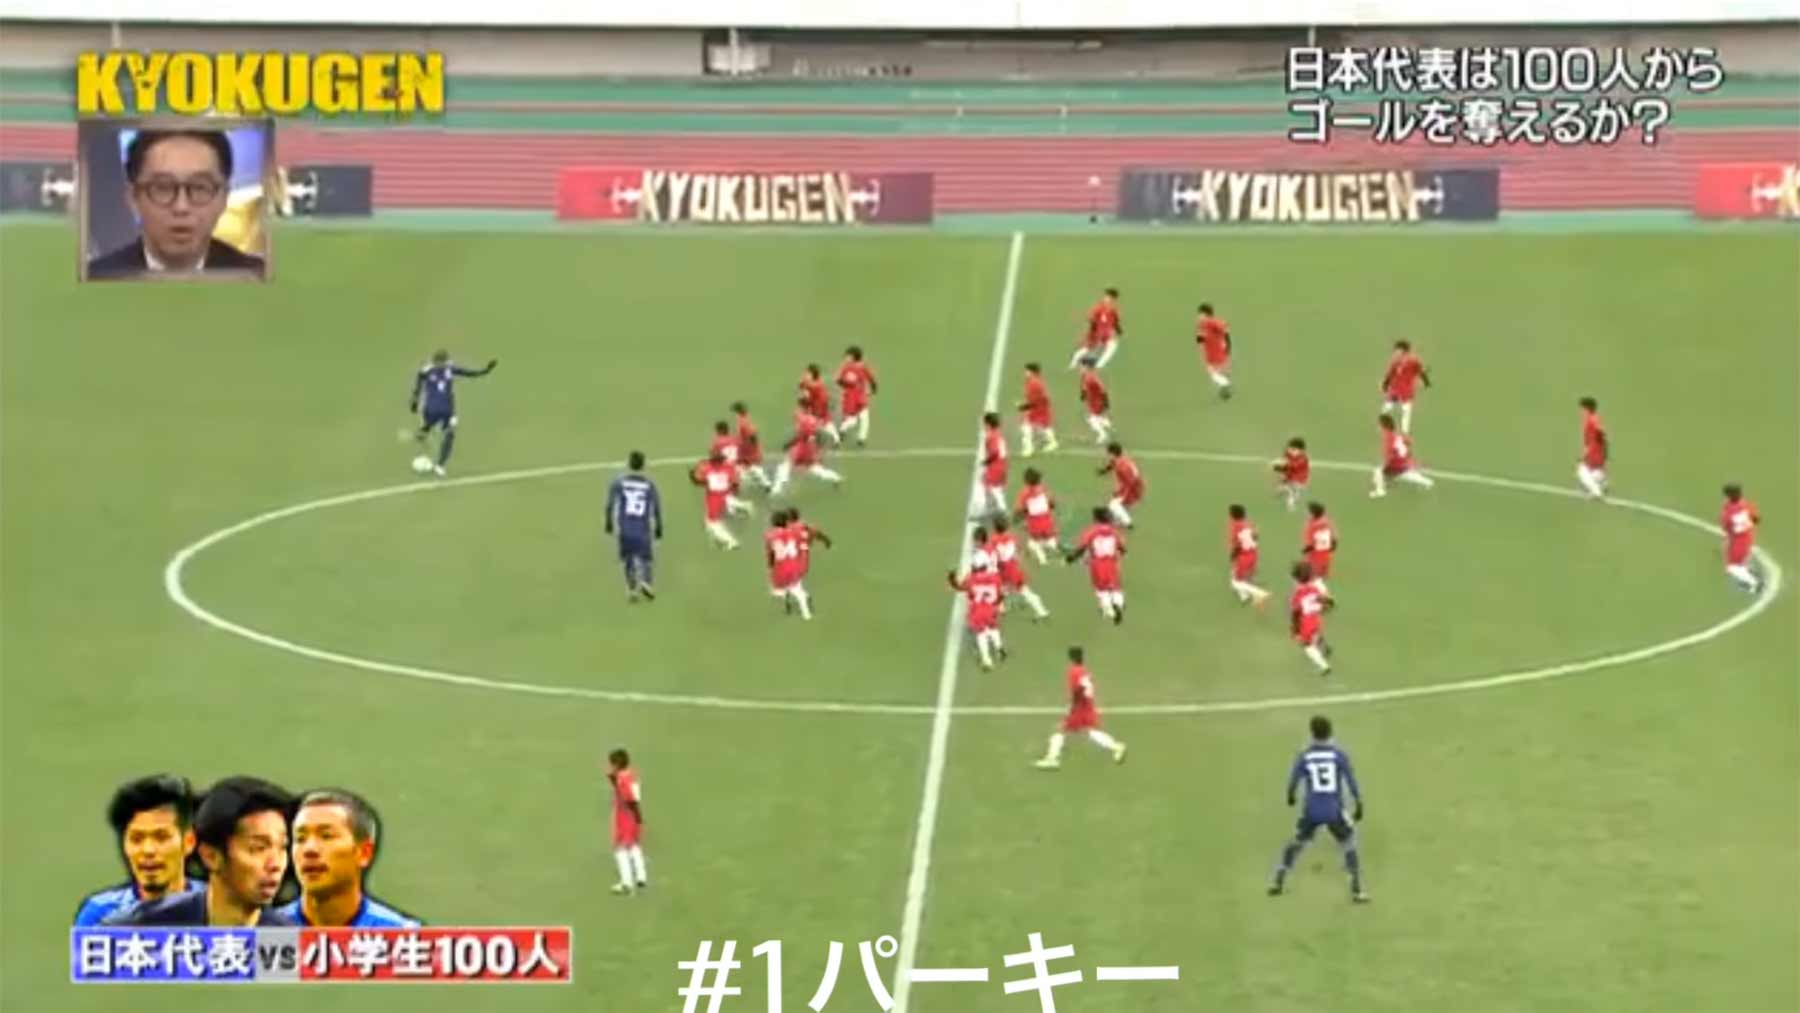 3 Fußballprofis gegen 100 Kinder japan-3-profis-gegen-100-kinder